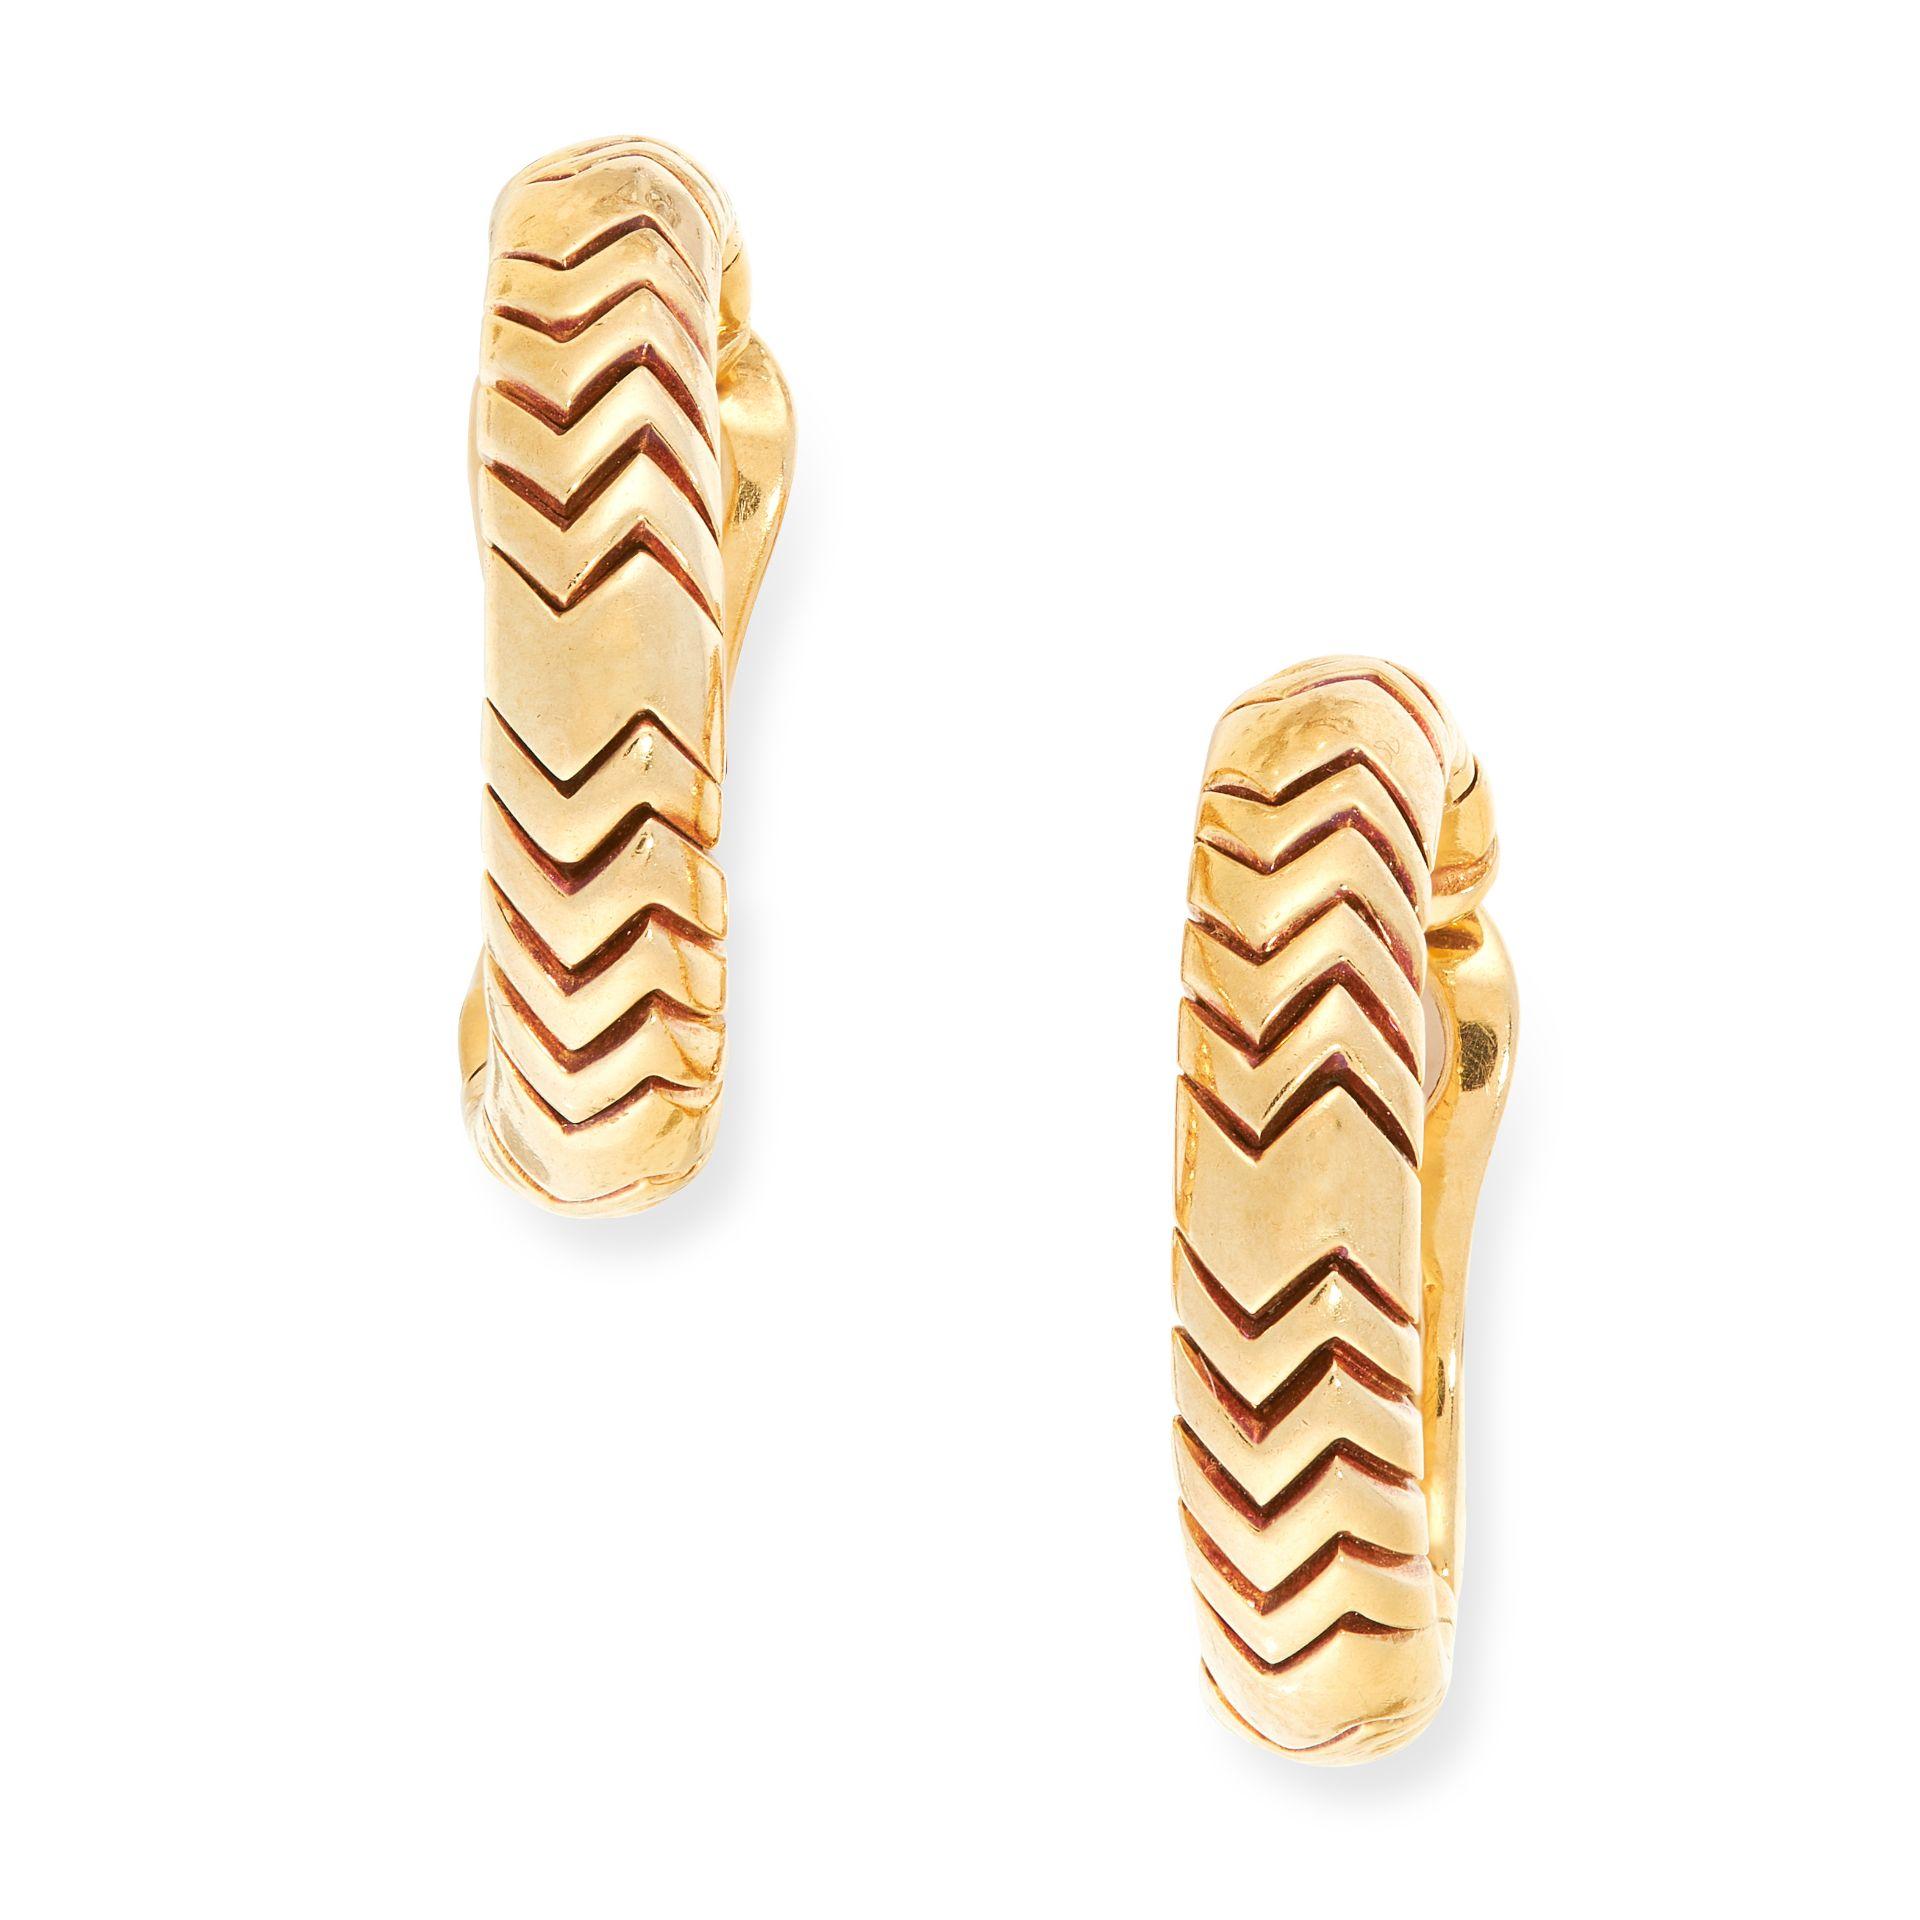 A PAIR OF SPIGA CLIP EARRINGS, BULGARI in 18ct yellow gold, each designed as a hoop, signed Bvlgari,